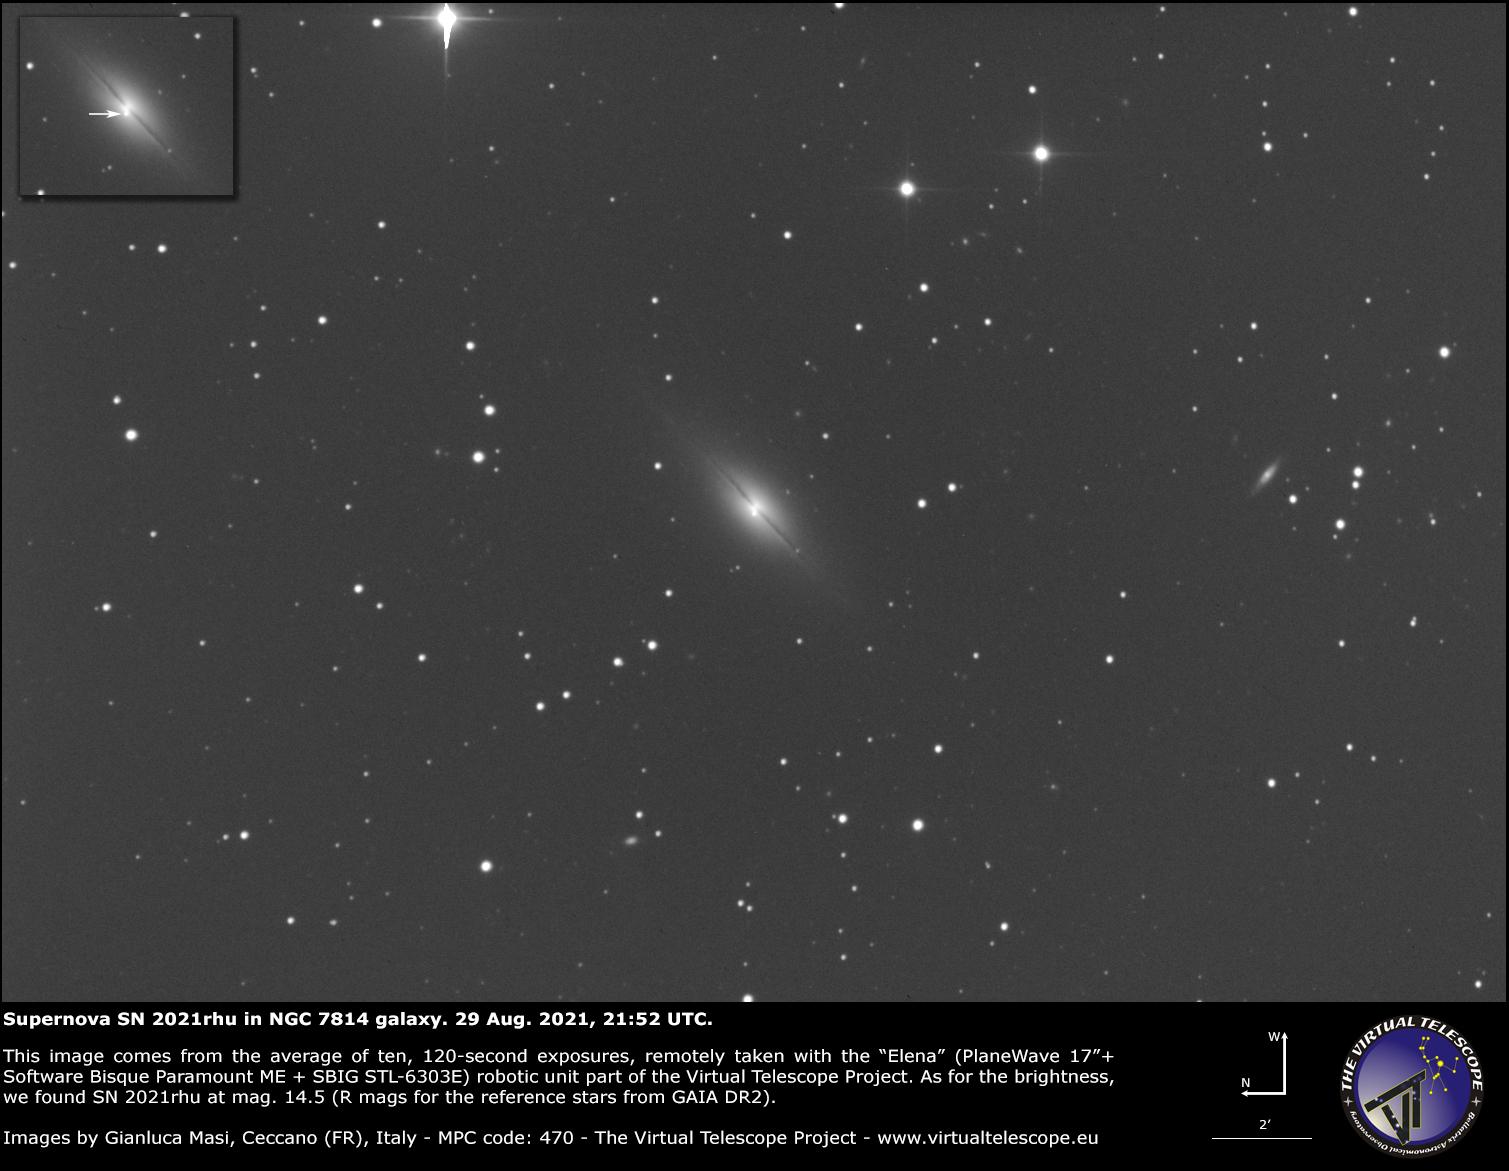 Supernova SN 2021rhu in NGC 7814 galaxy: an image - 29 Aug. 2021.